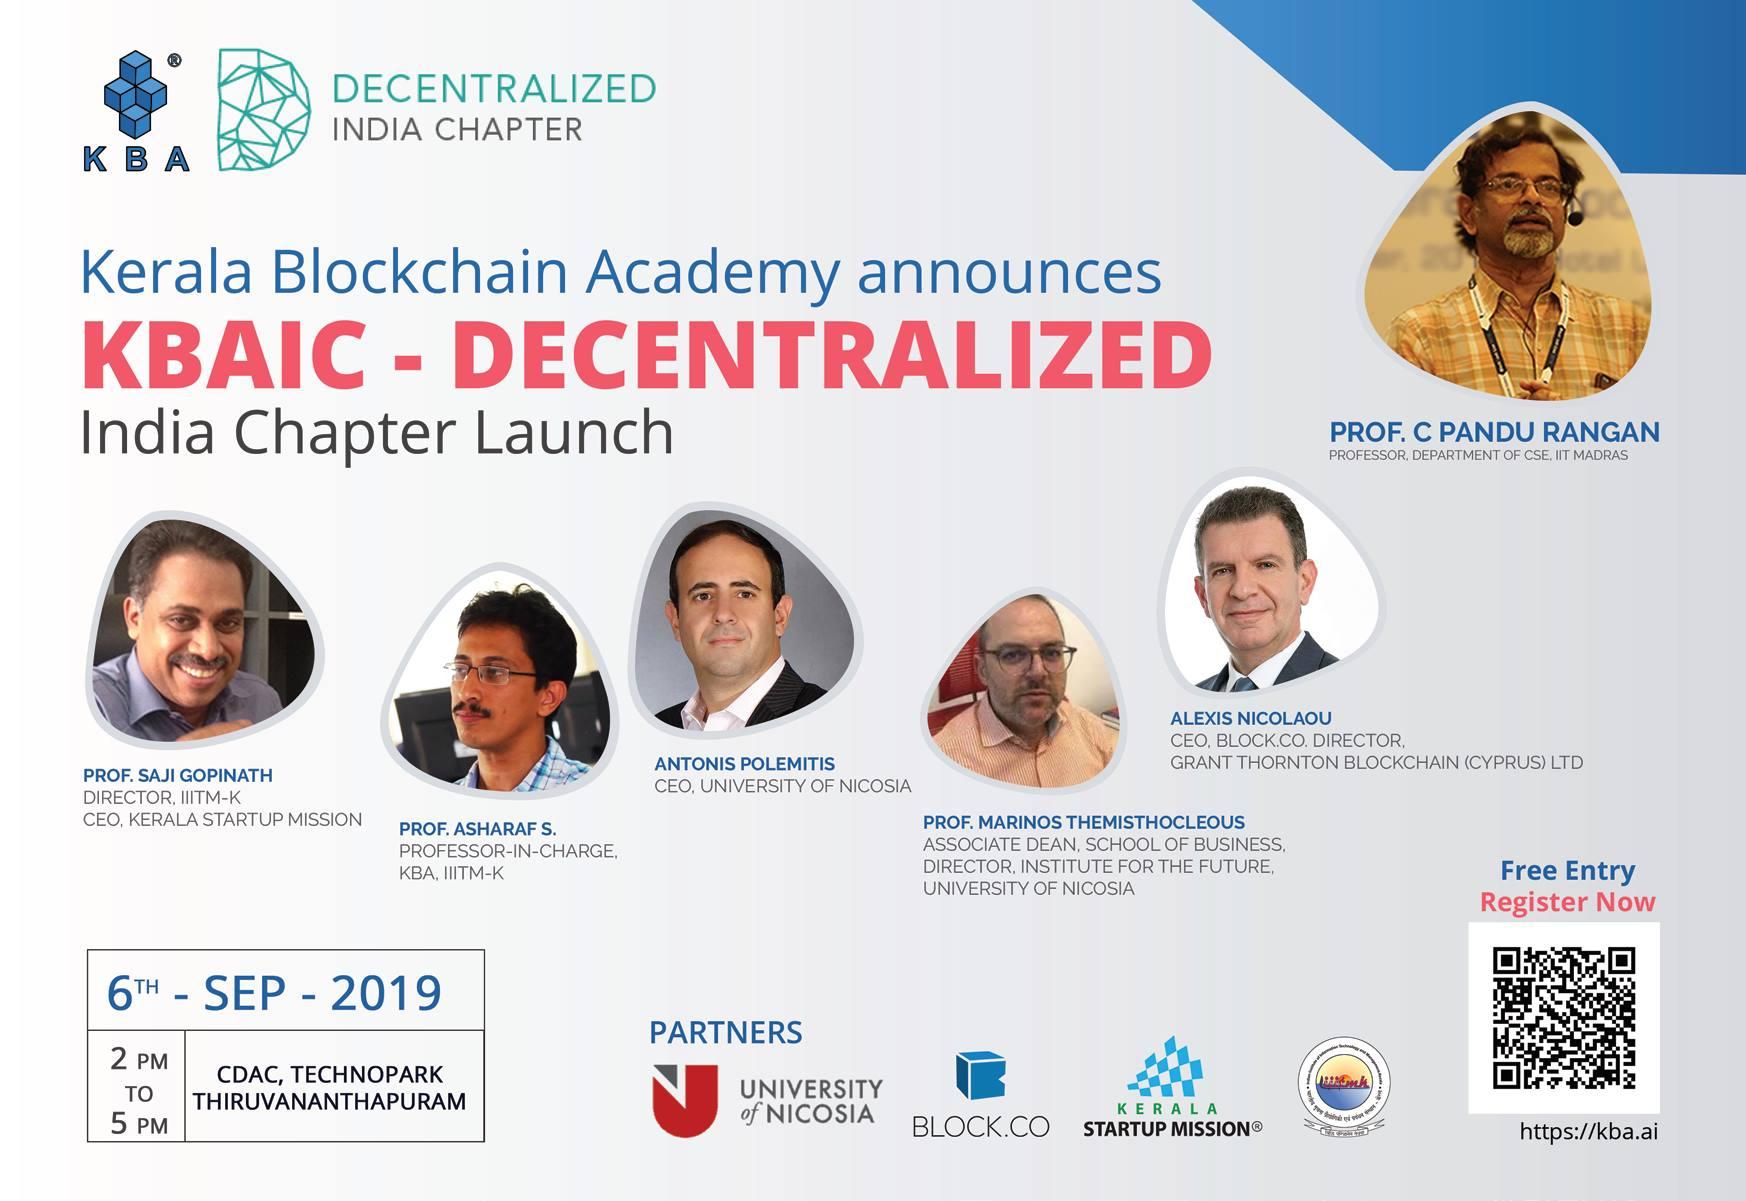 Kerala Blockchain Academy